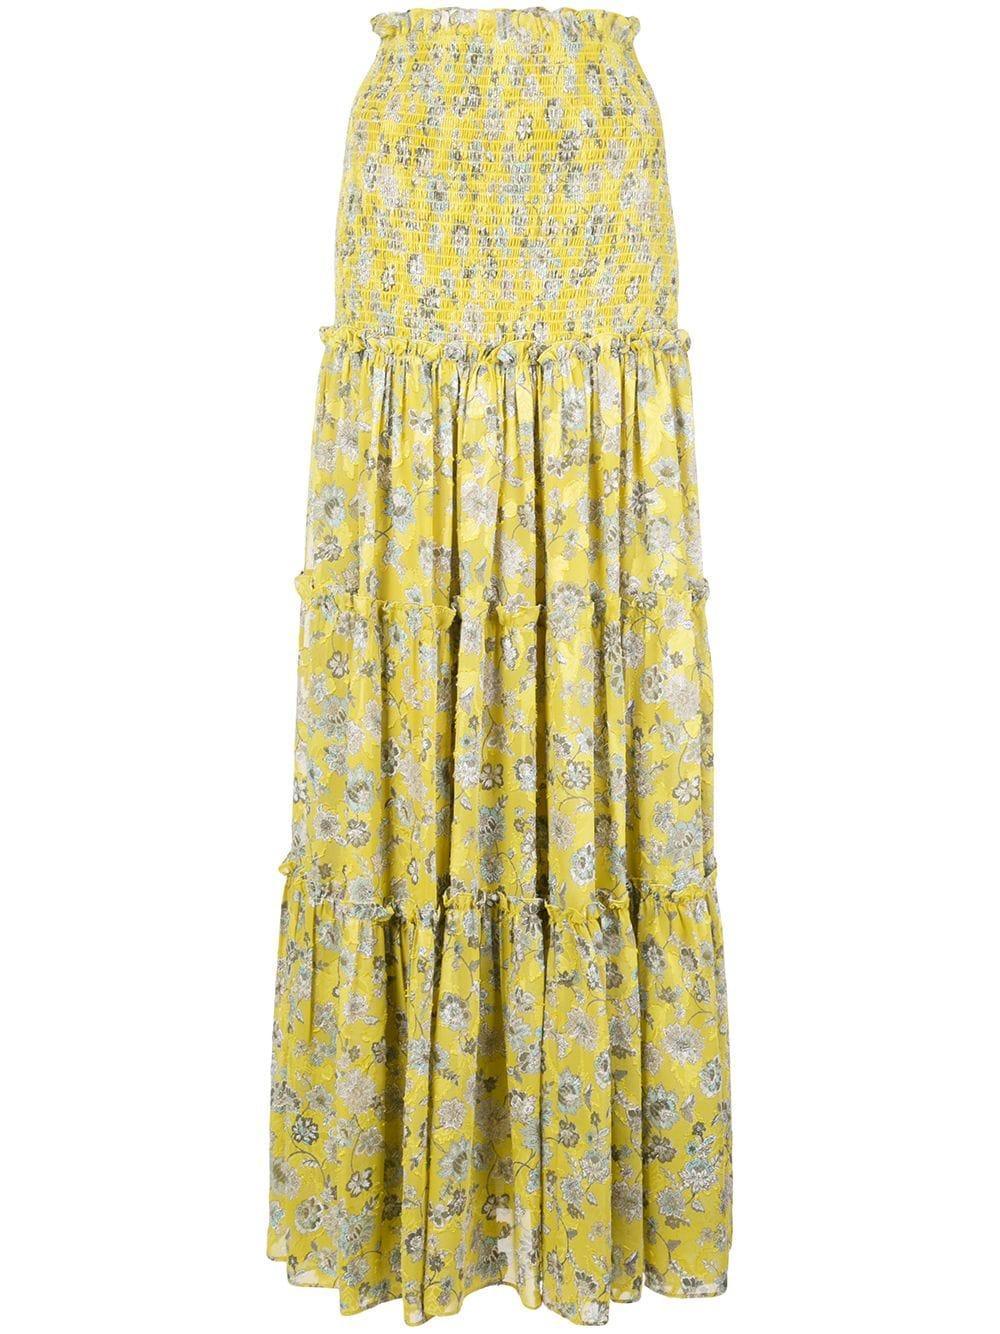 Galarza Flower Print Ruffle Trim Maxi Skirt